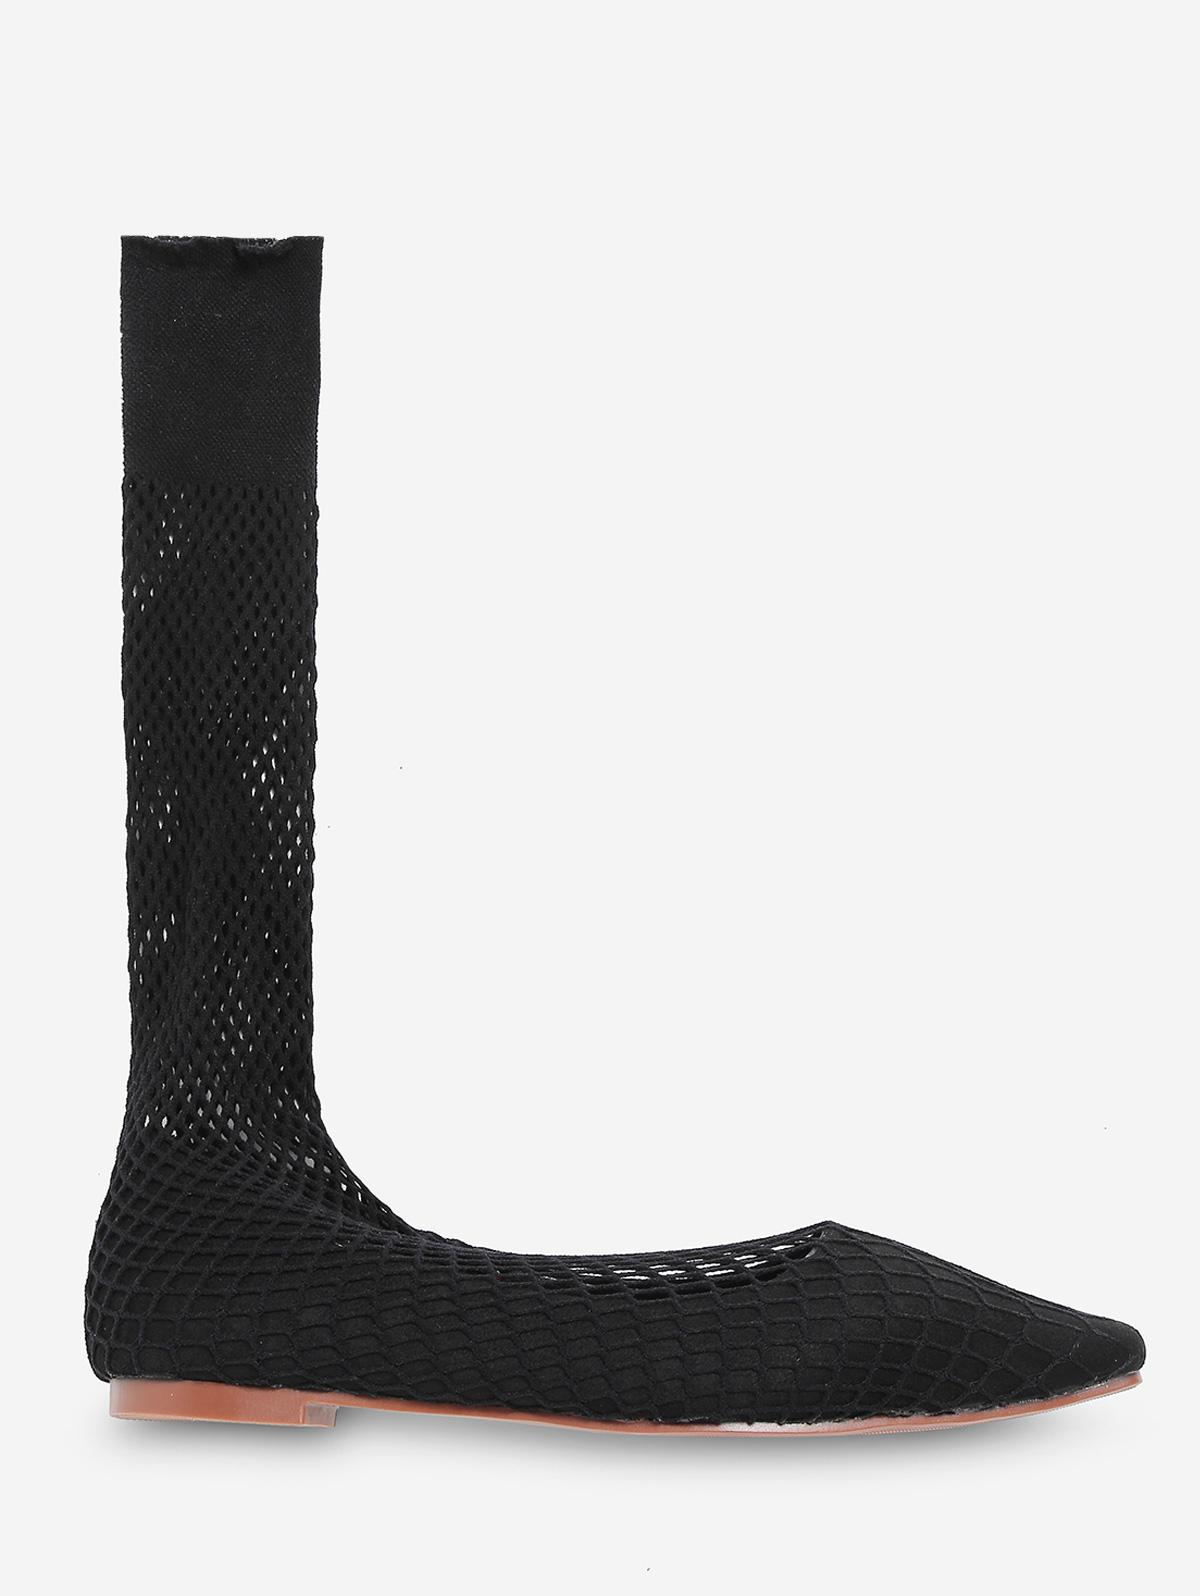 Square Toe Sheer Mid Calf Flat Sock Boots